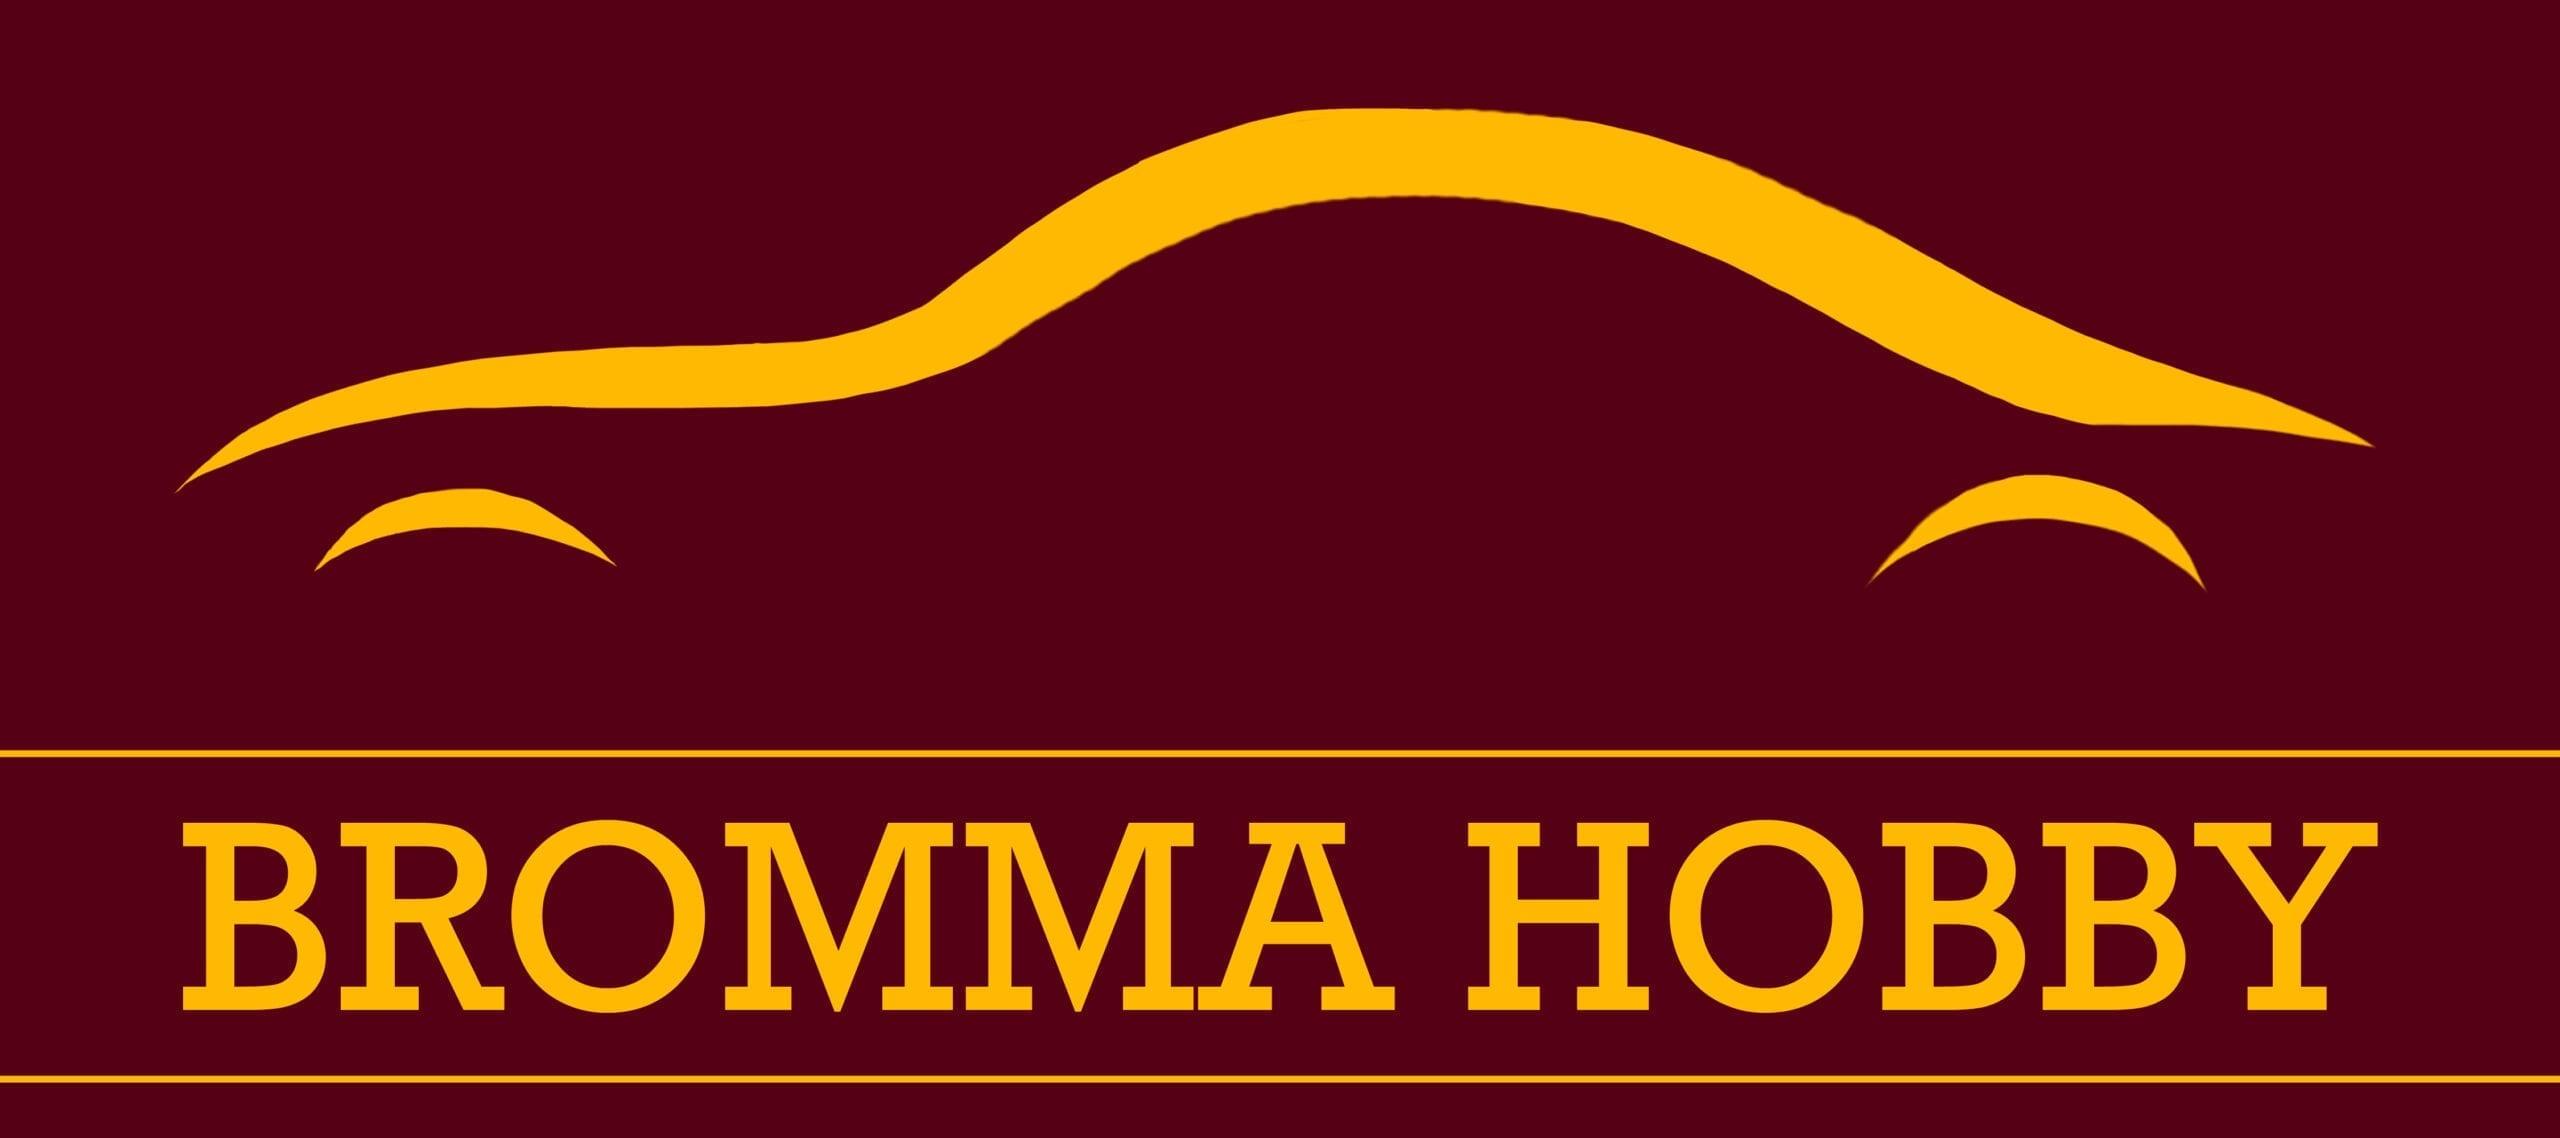 Bromma Hobby